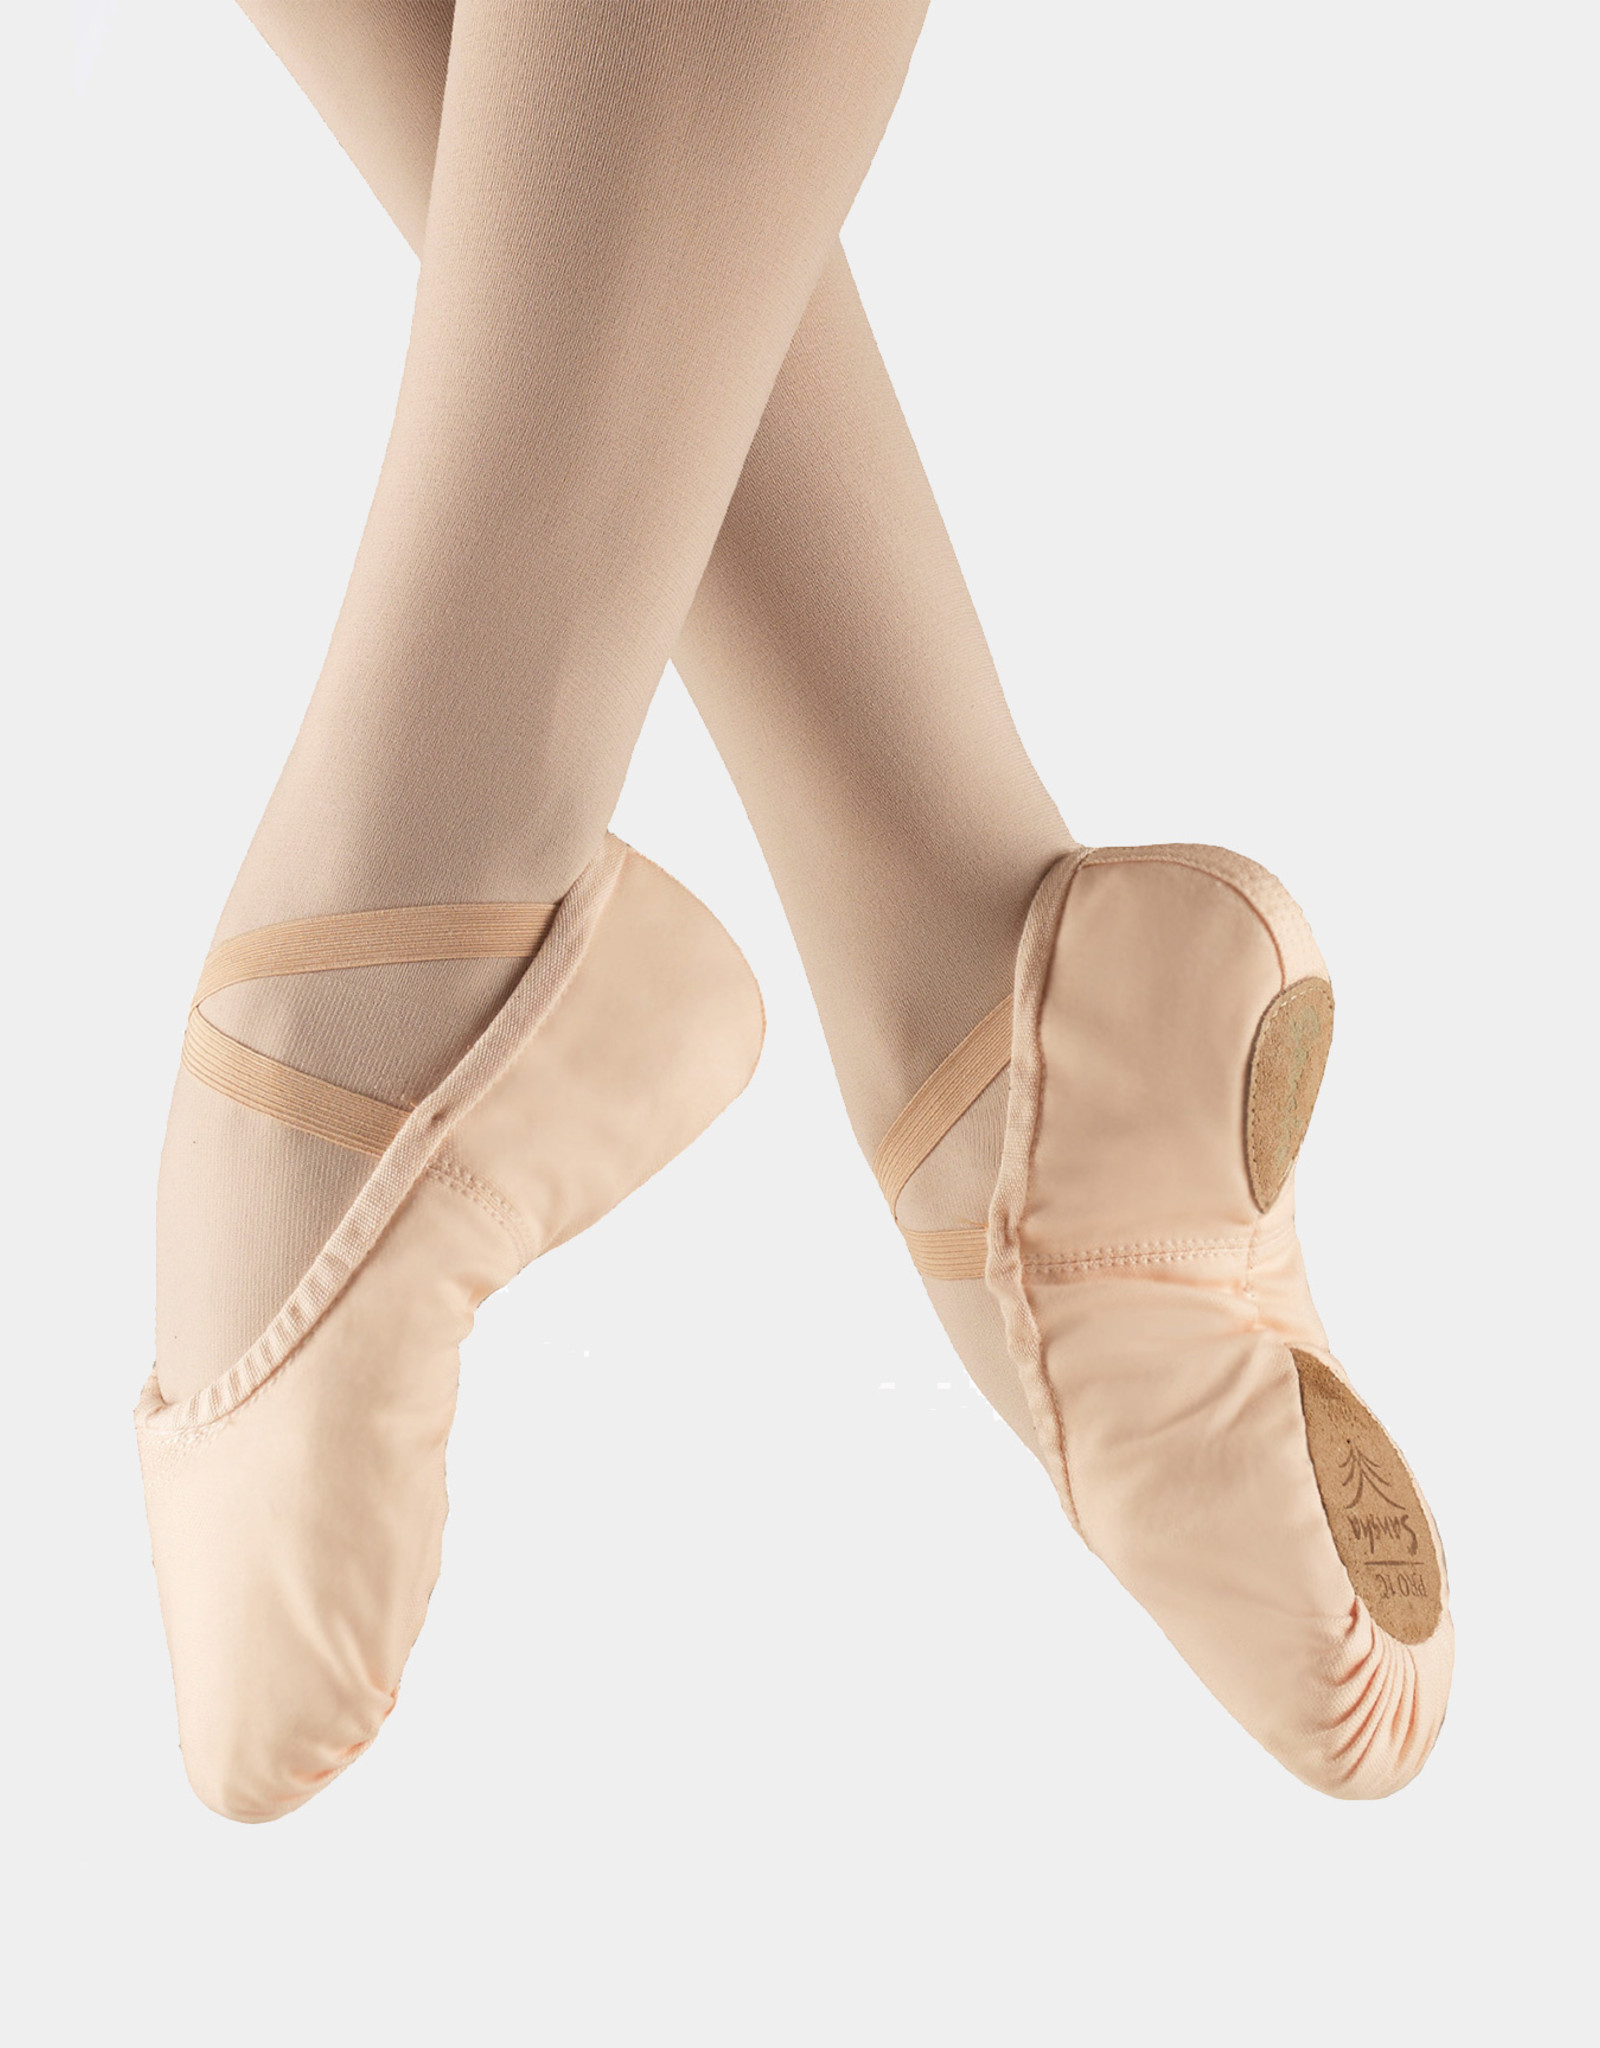 SANSHA PRO CANVA SPLIT SOLE BALLET SLIPPERS (1C)